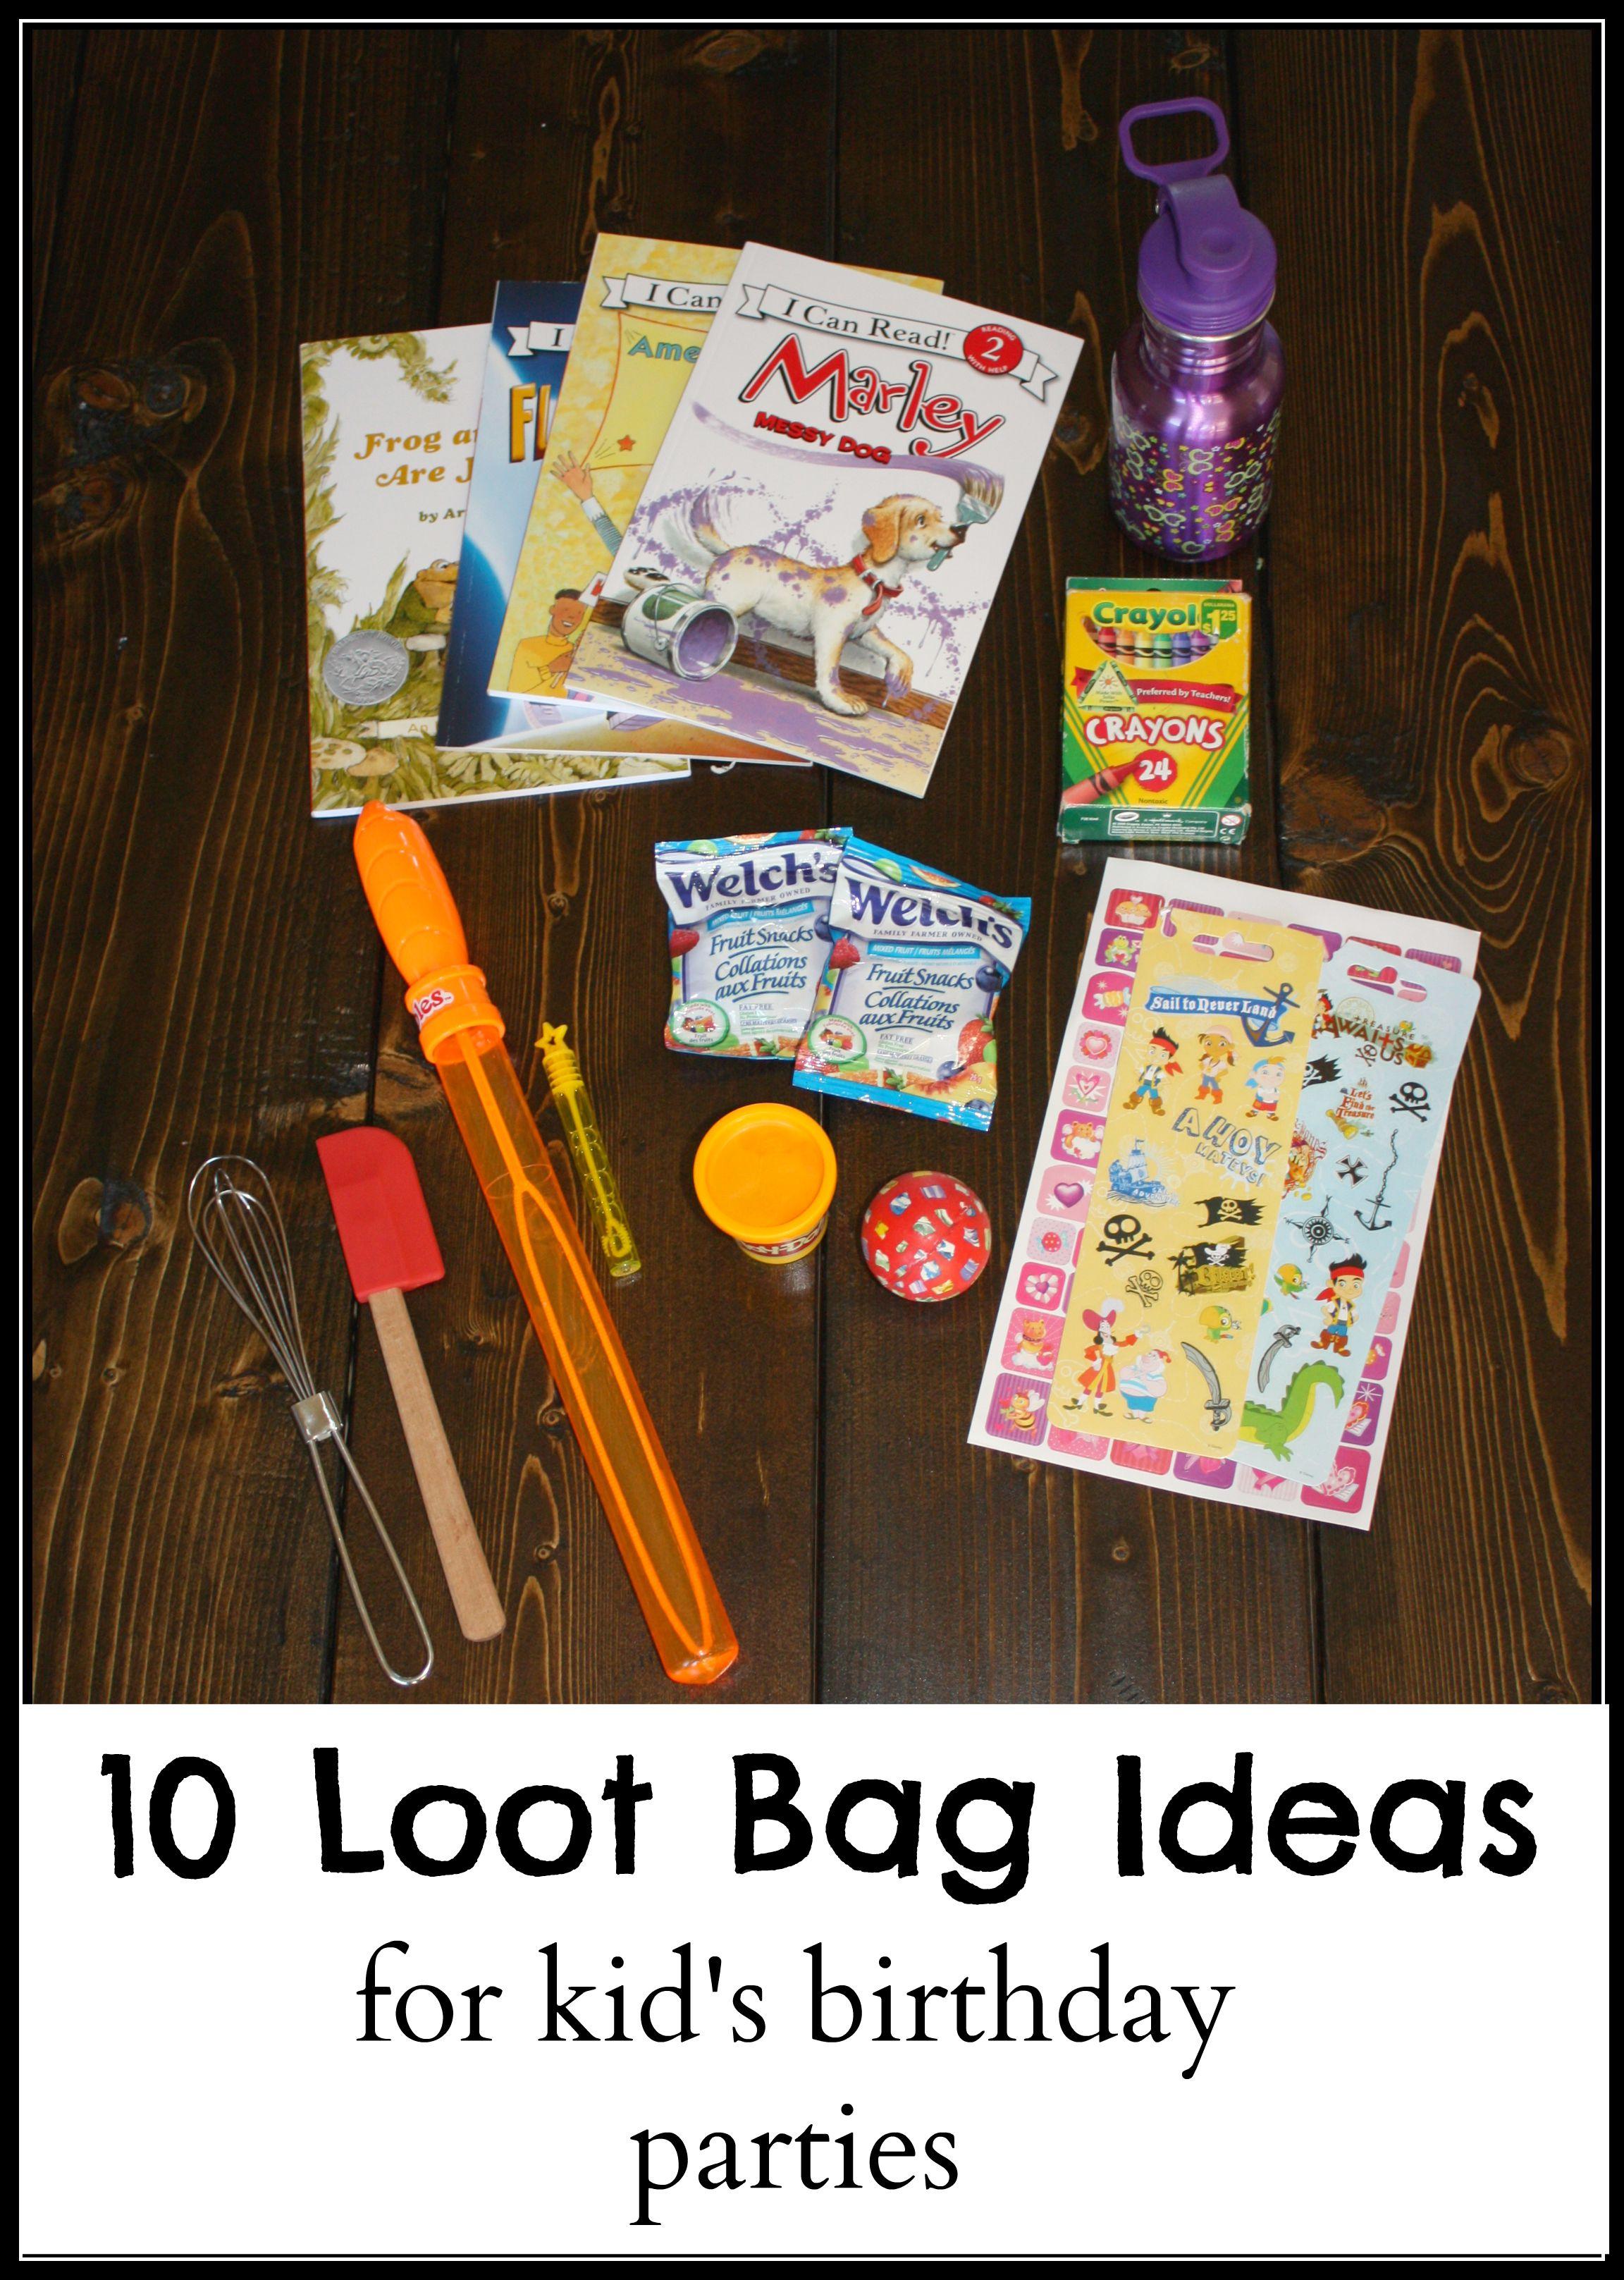 10 Loot Bag Ideas